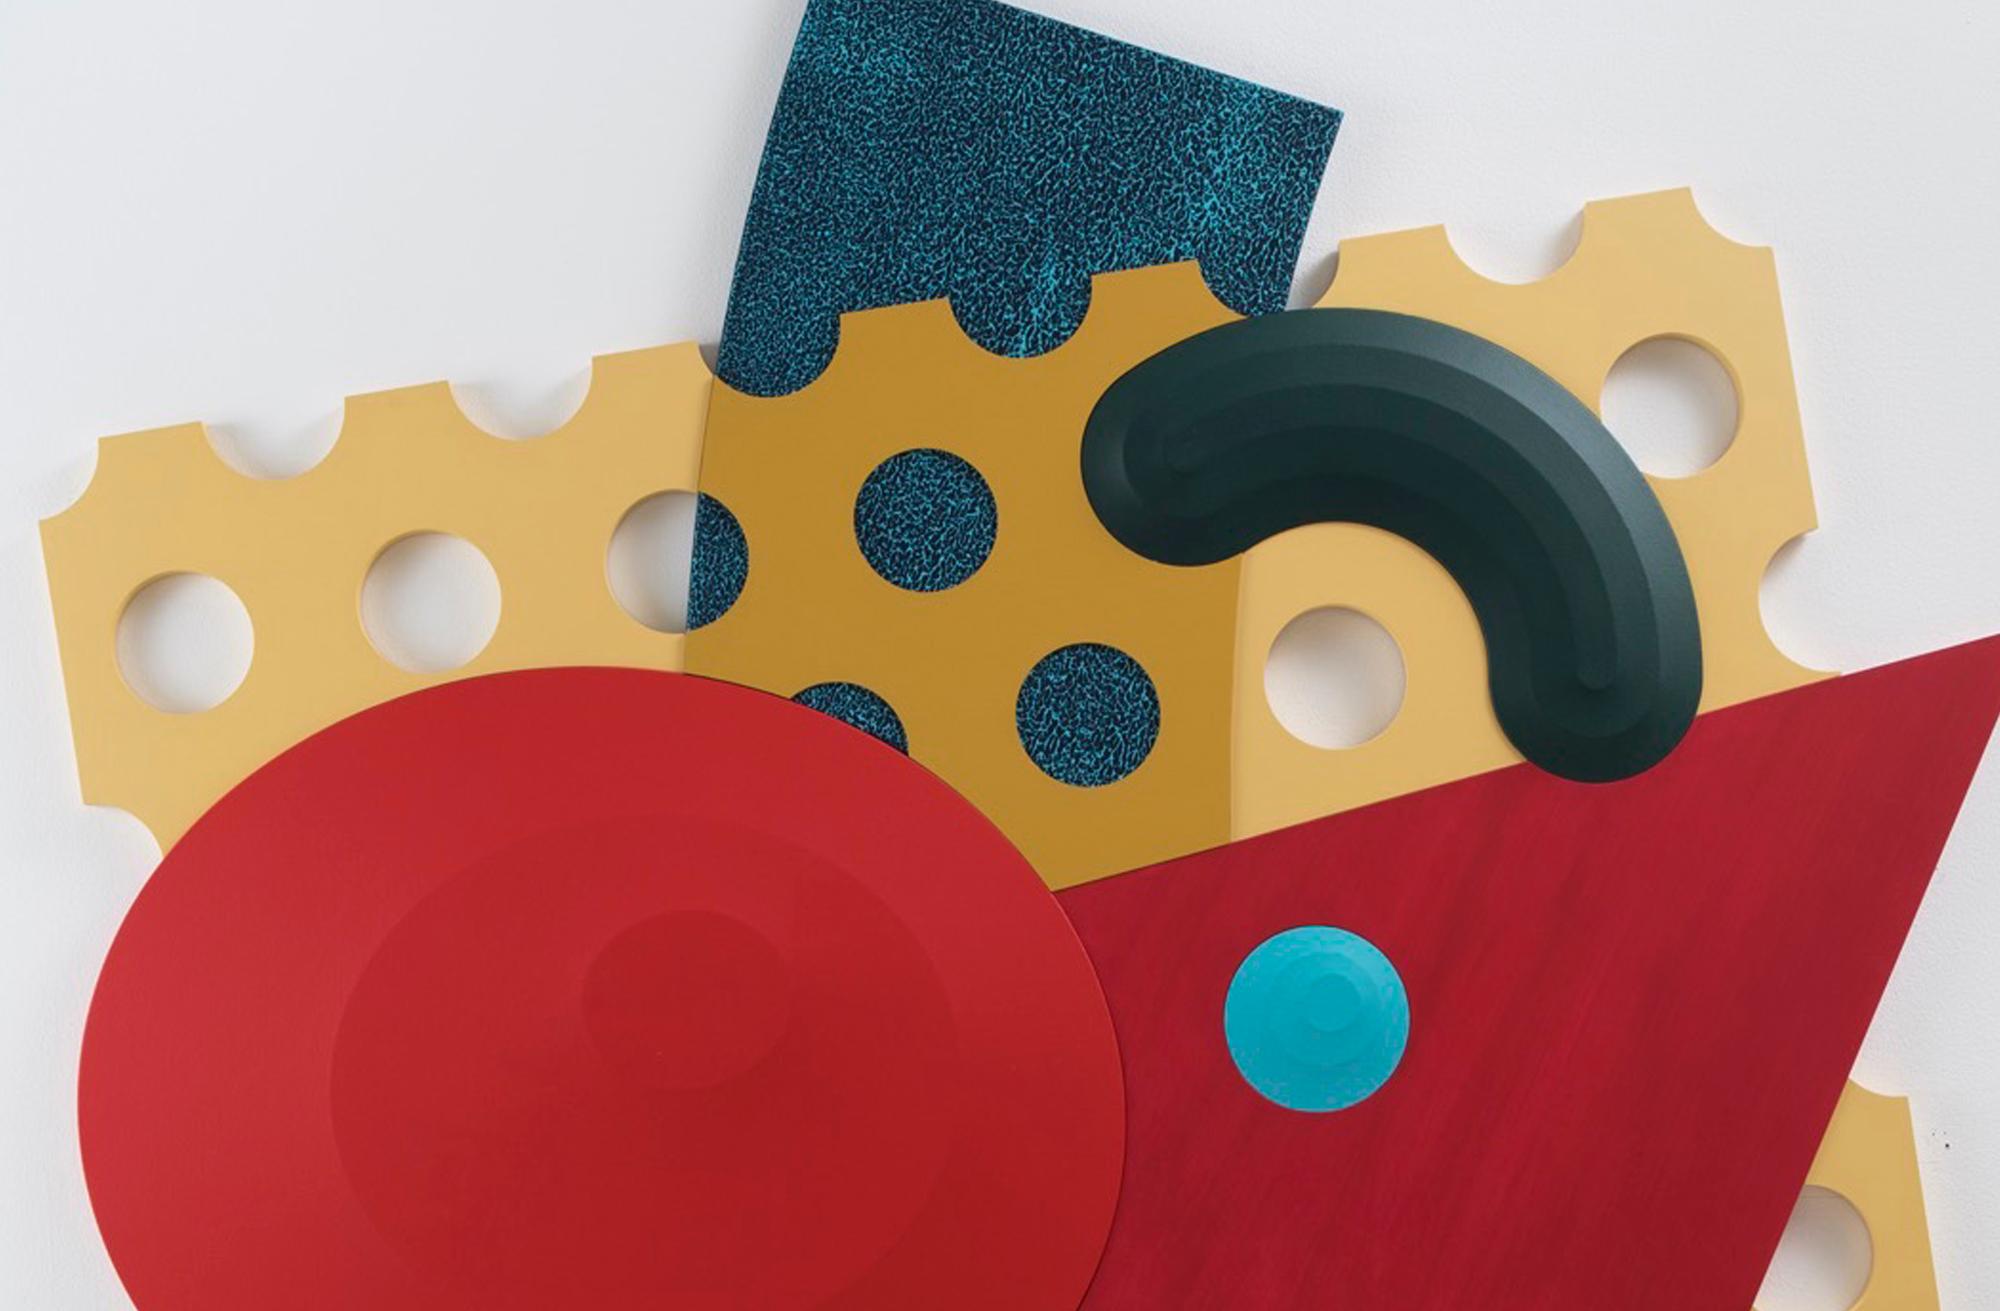 Josh Sperling réinvente la toile chez Perrotin